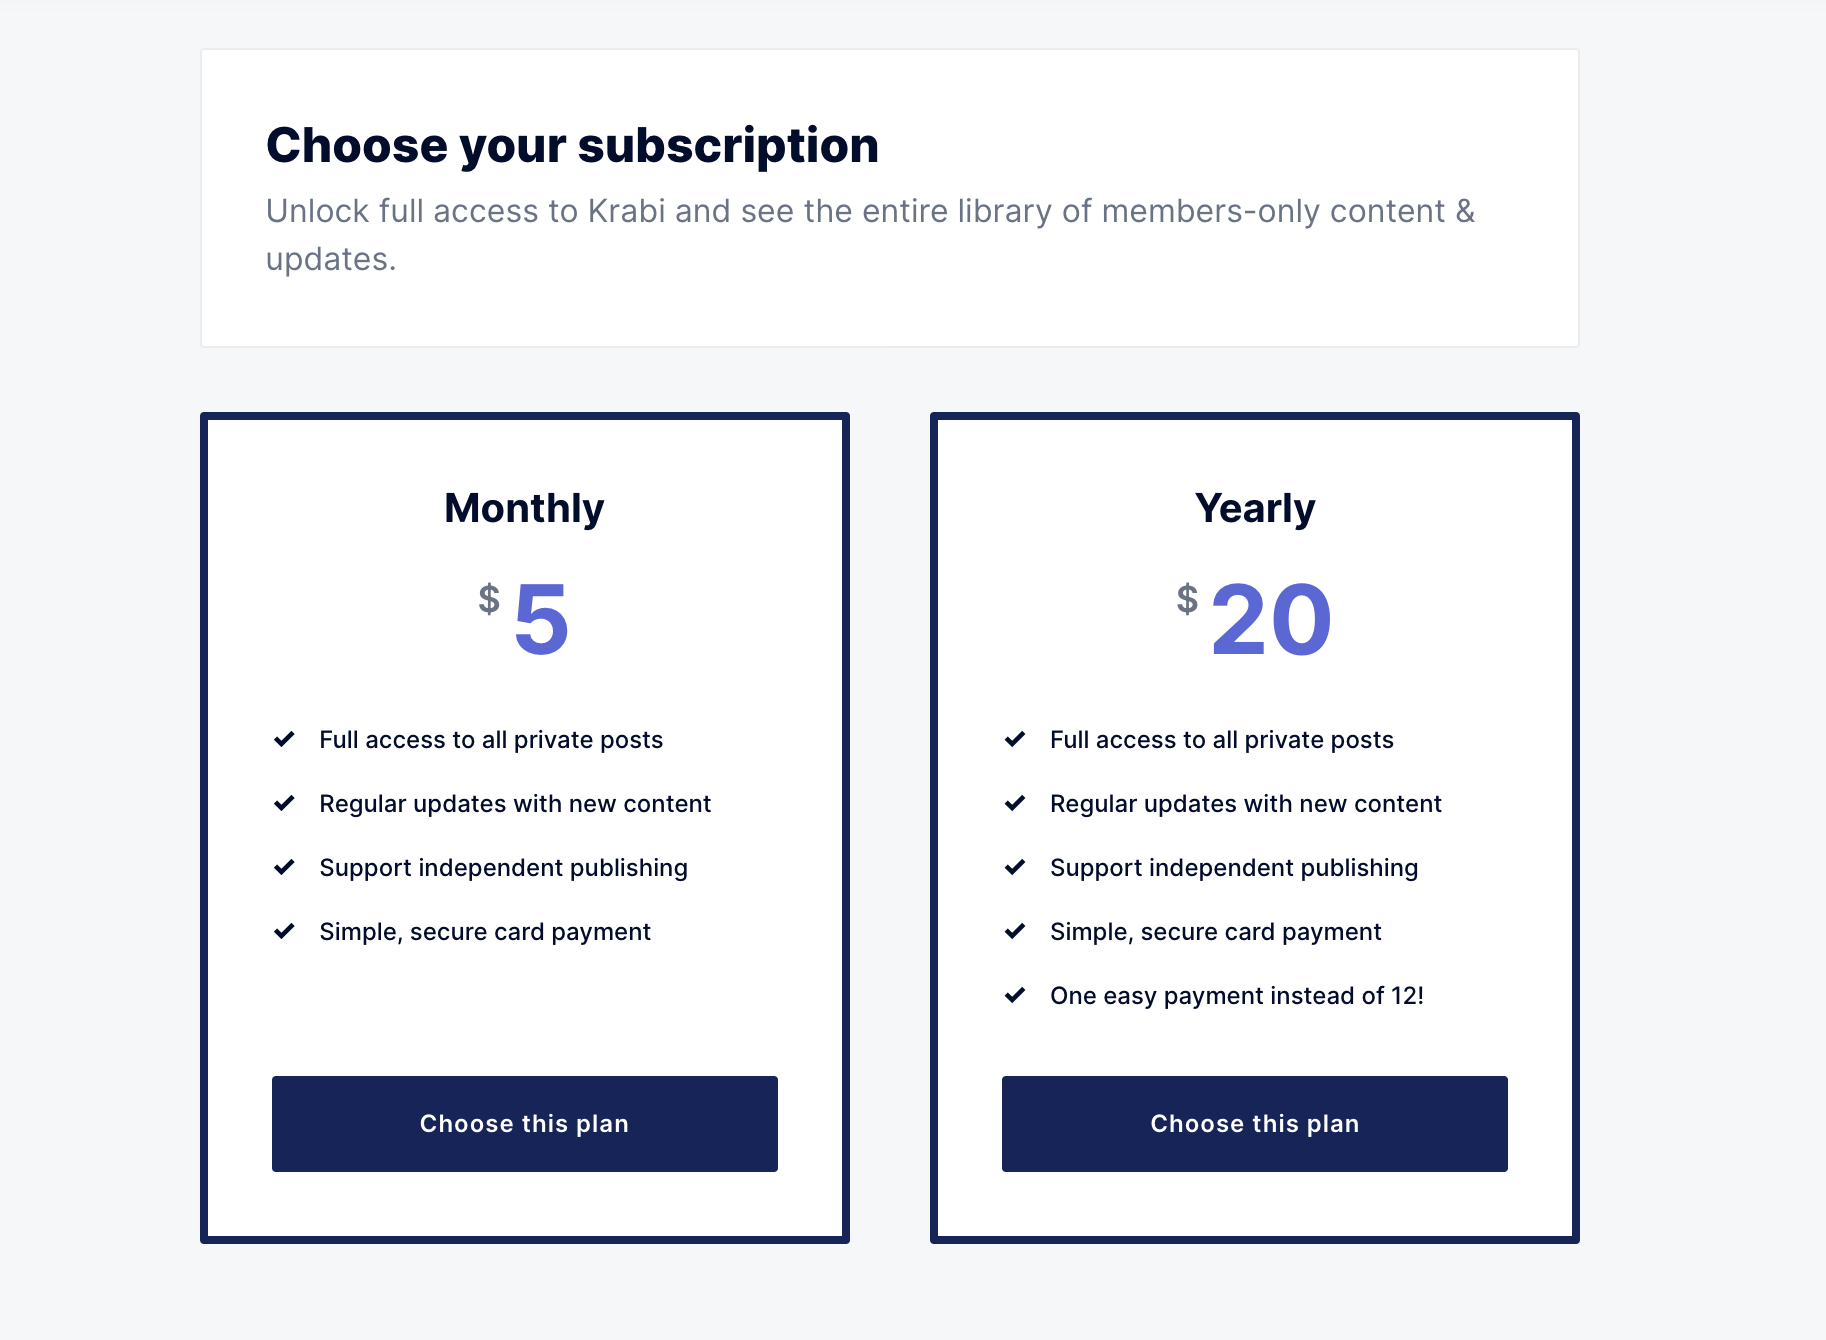 Subscription plans in Krabi